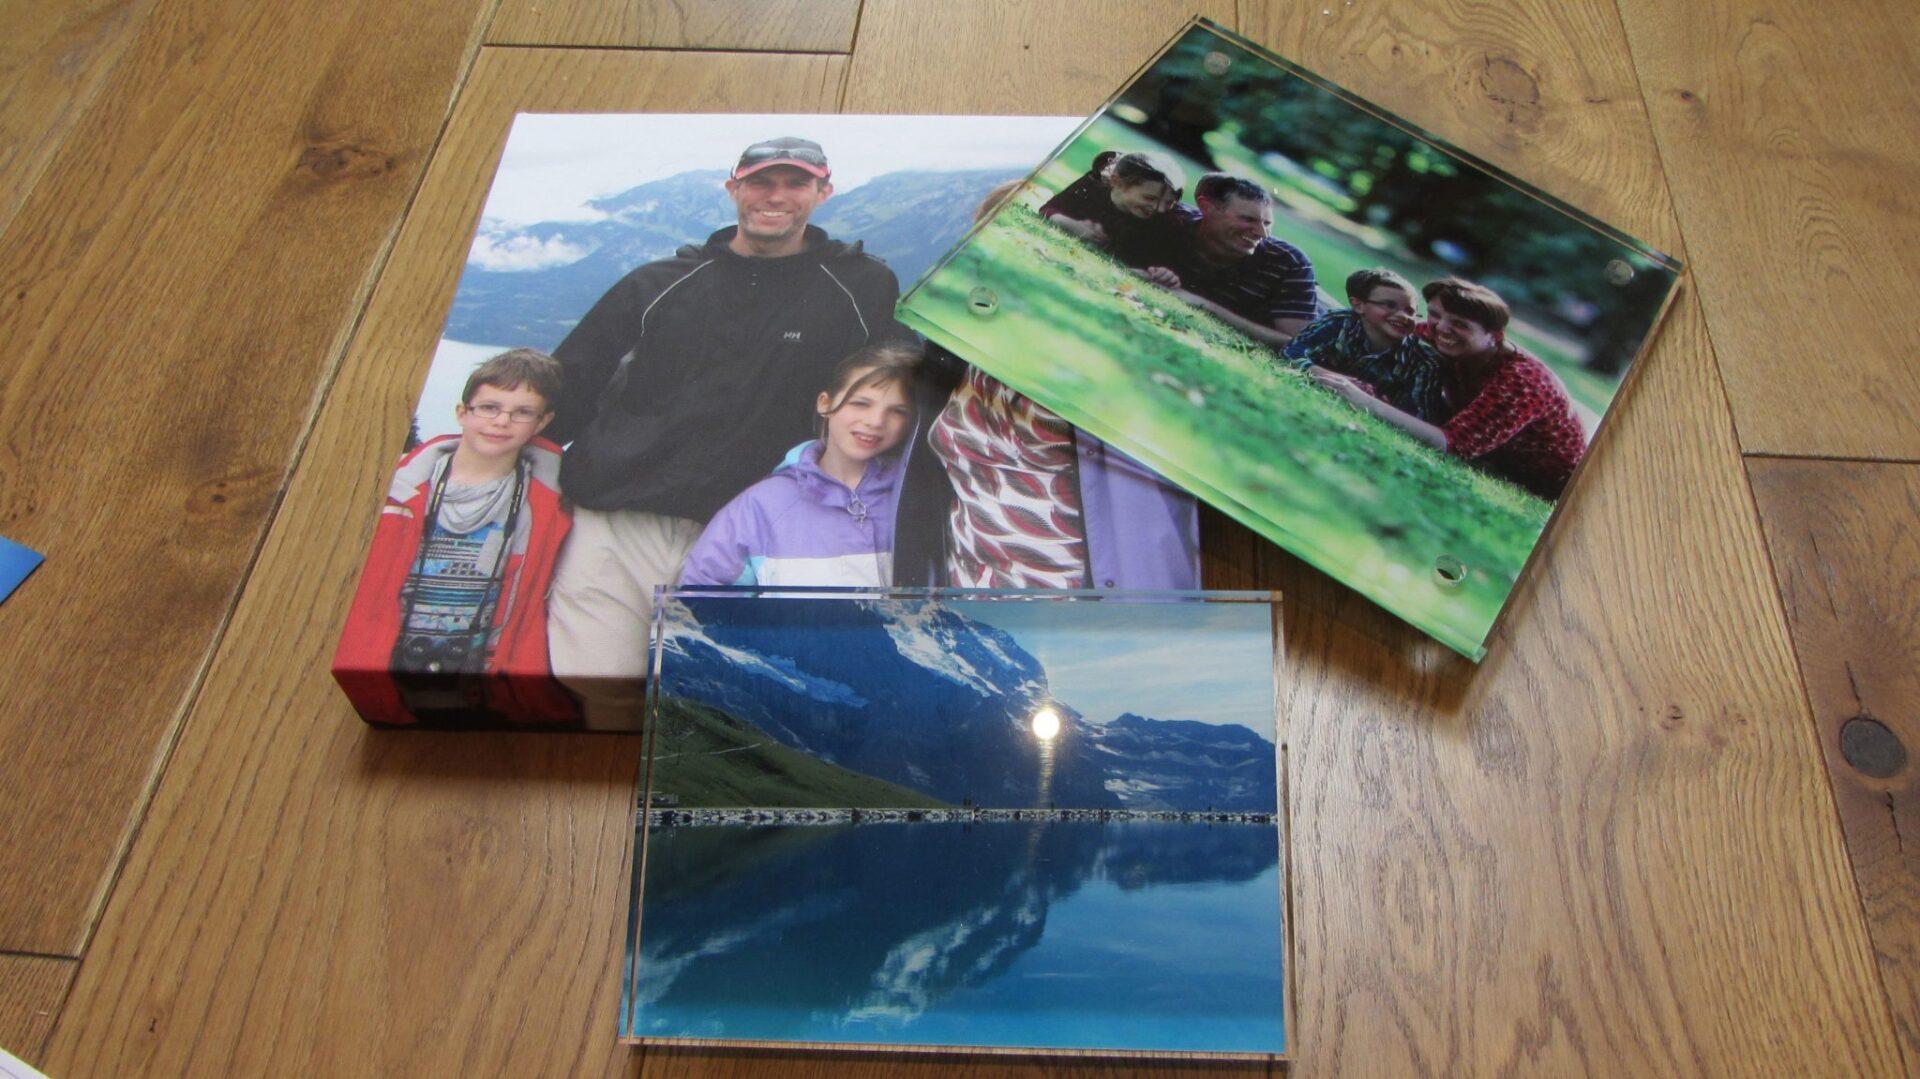 Truprint Photo Gifts: Variety